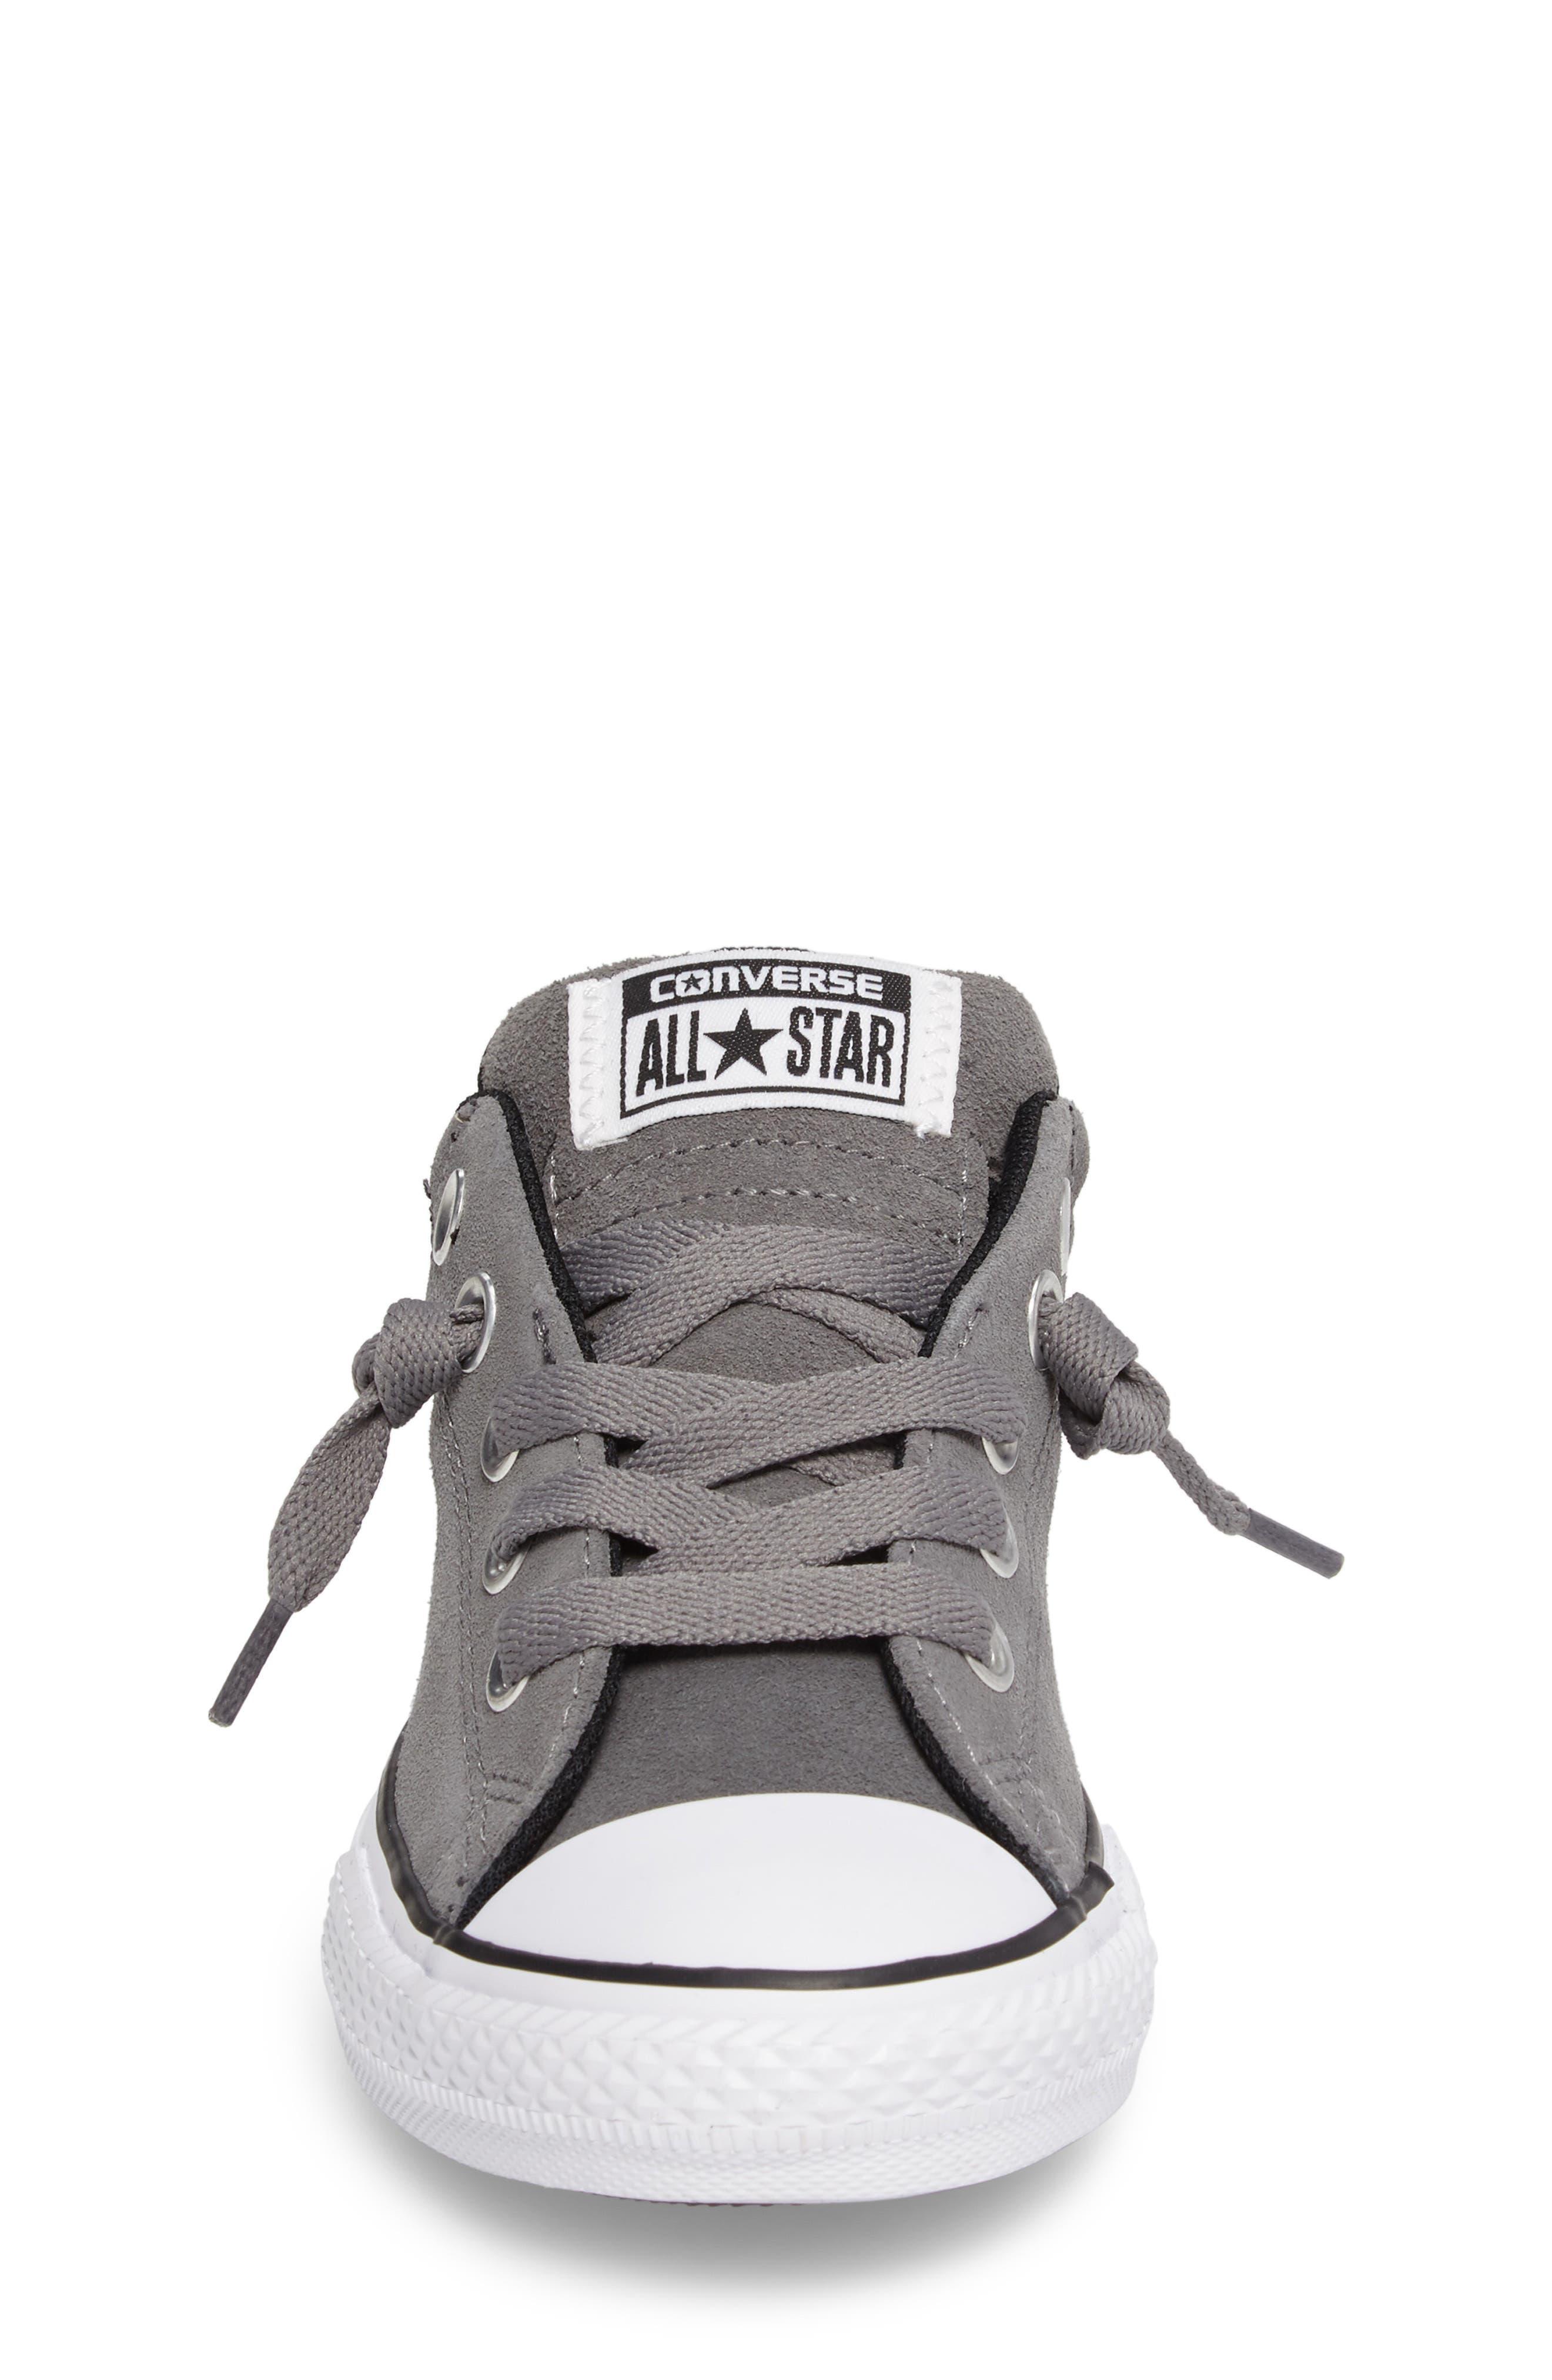 Chuck Taylor<sup>®</sup> All Star<sup>®</sup> Street Sneaker,                             Alternate thumbnail 4, color,                             Mason/ Black/ White